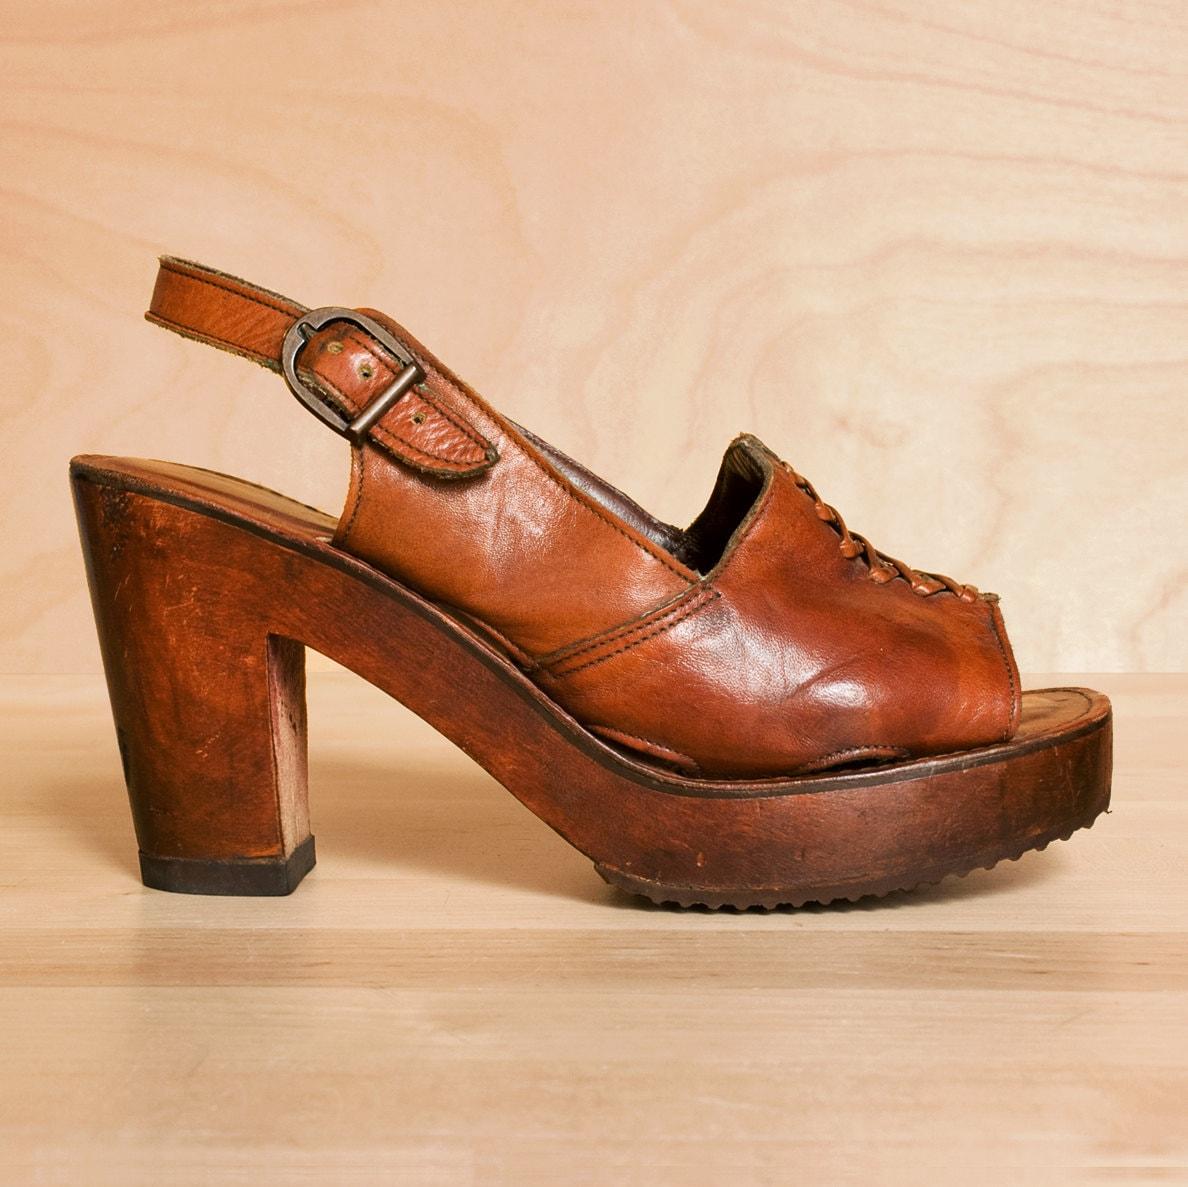 vintage 1970s platform shoes 8 7 5 platform by kenaione